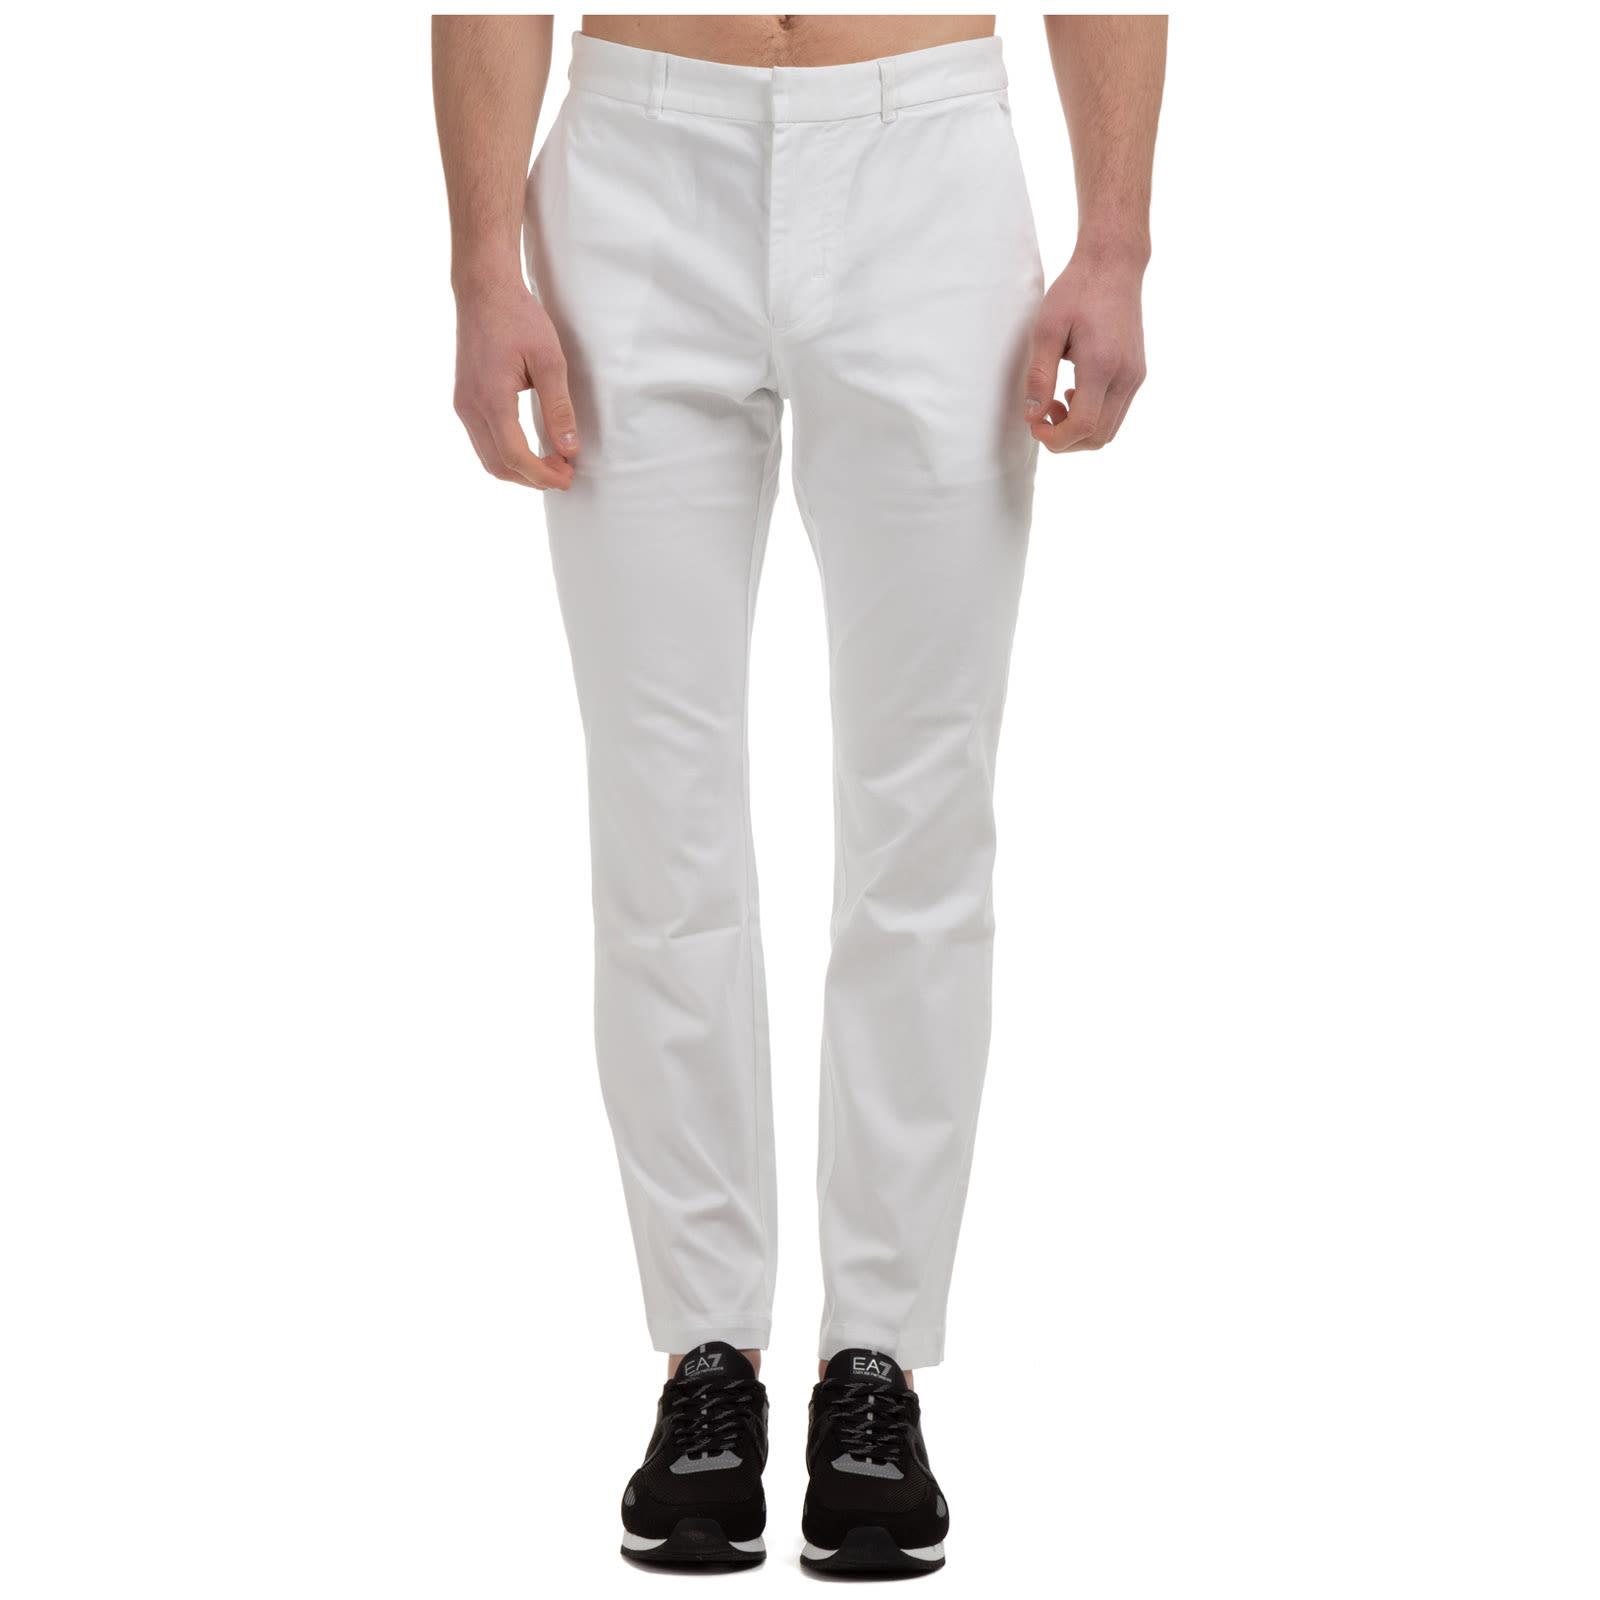 Emporio Armani Ventus 7 Jeans